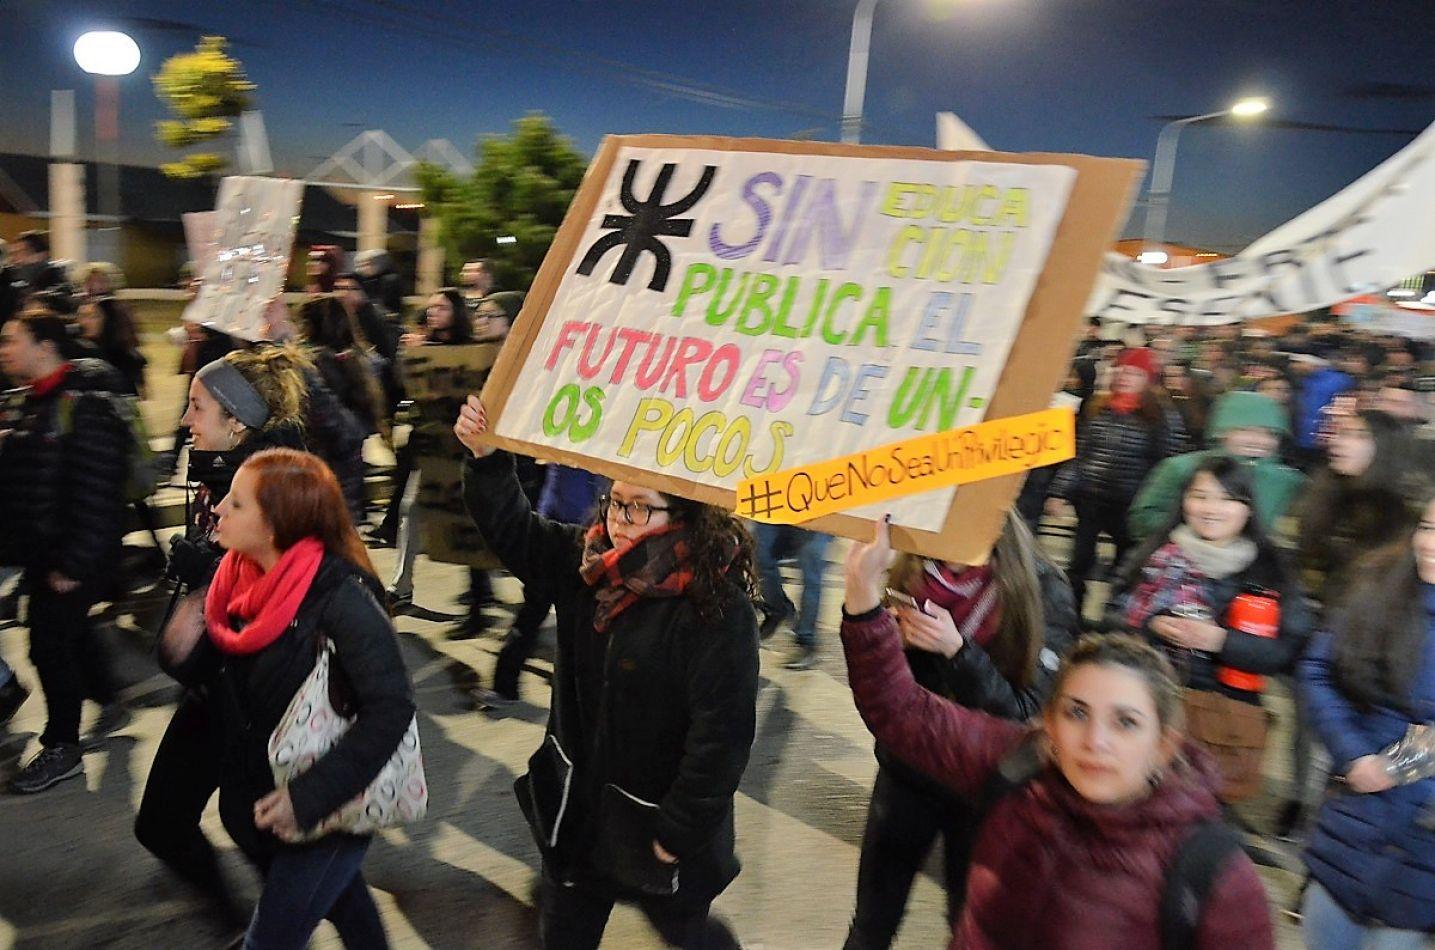 Encuentro patagónico con reclamo universitario